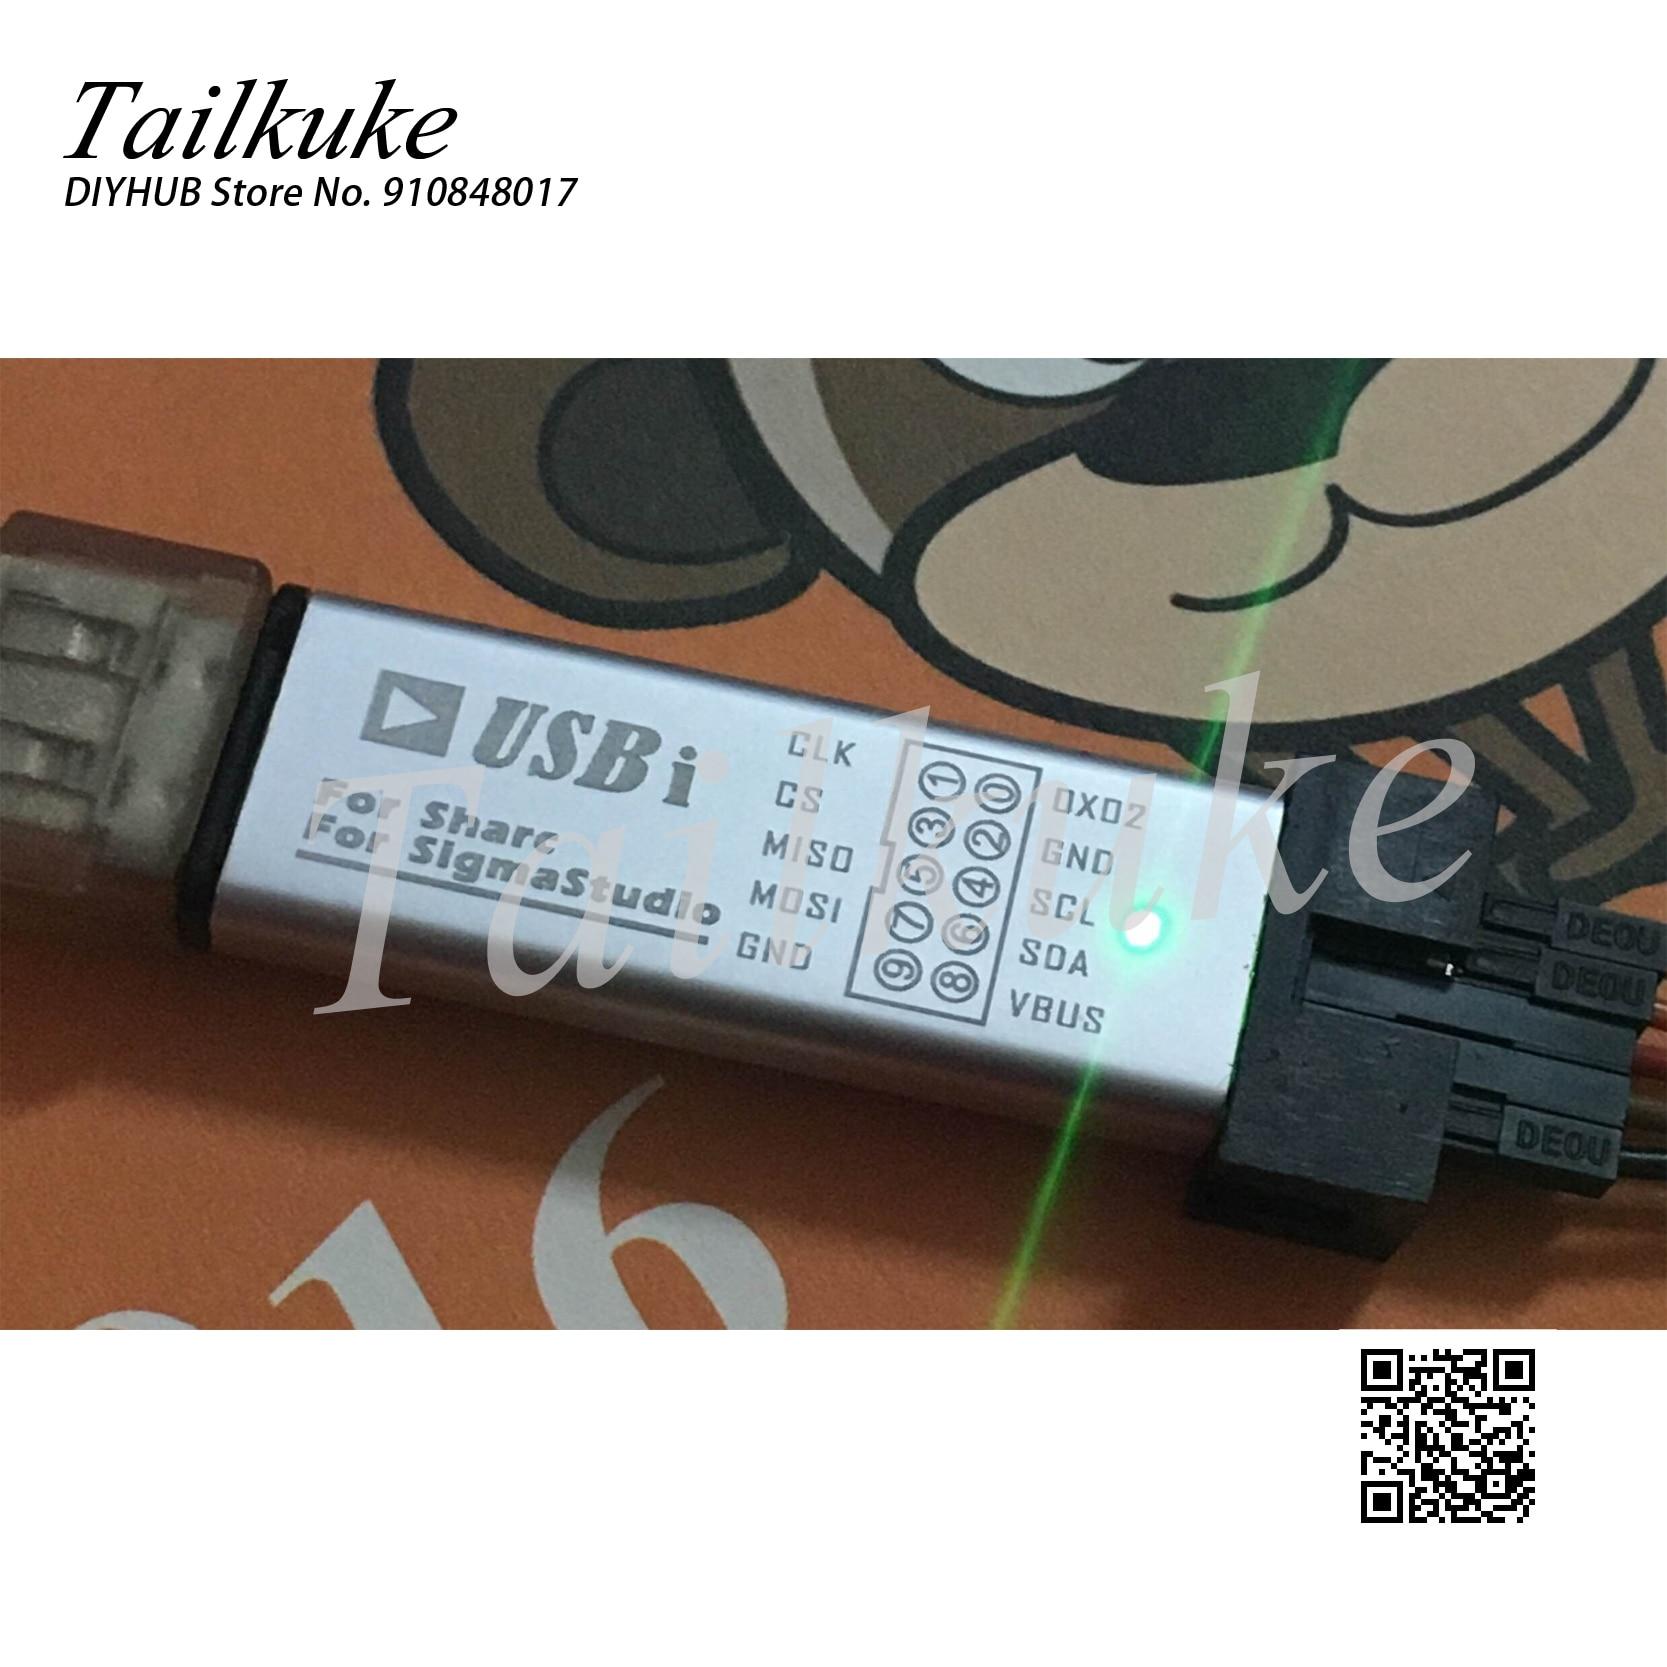 USBi SIGMASTUDIO المحاكي الموقد EVAL-ADUSB2EBUZ